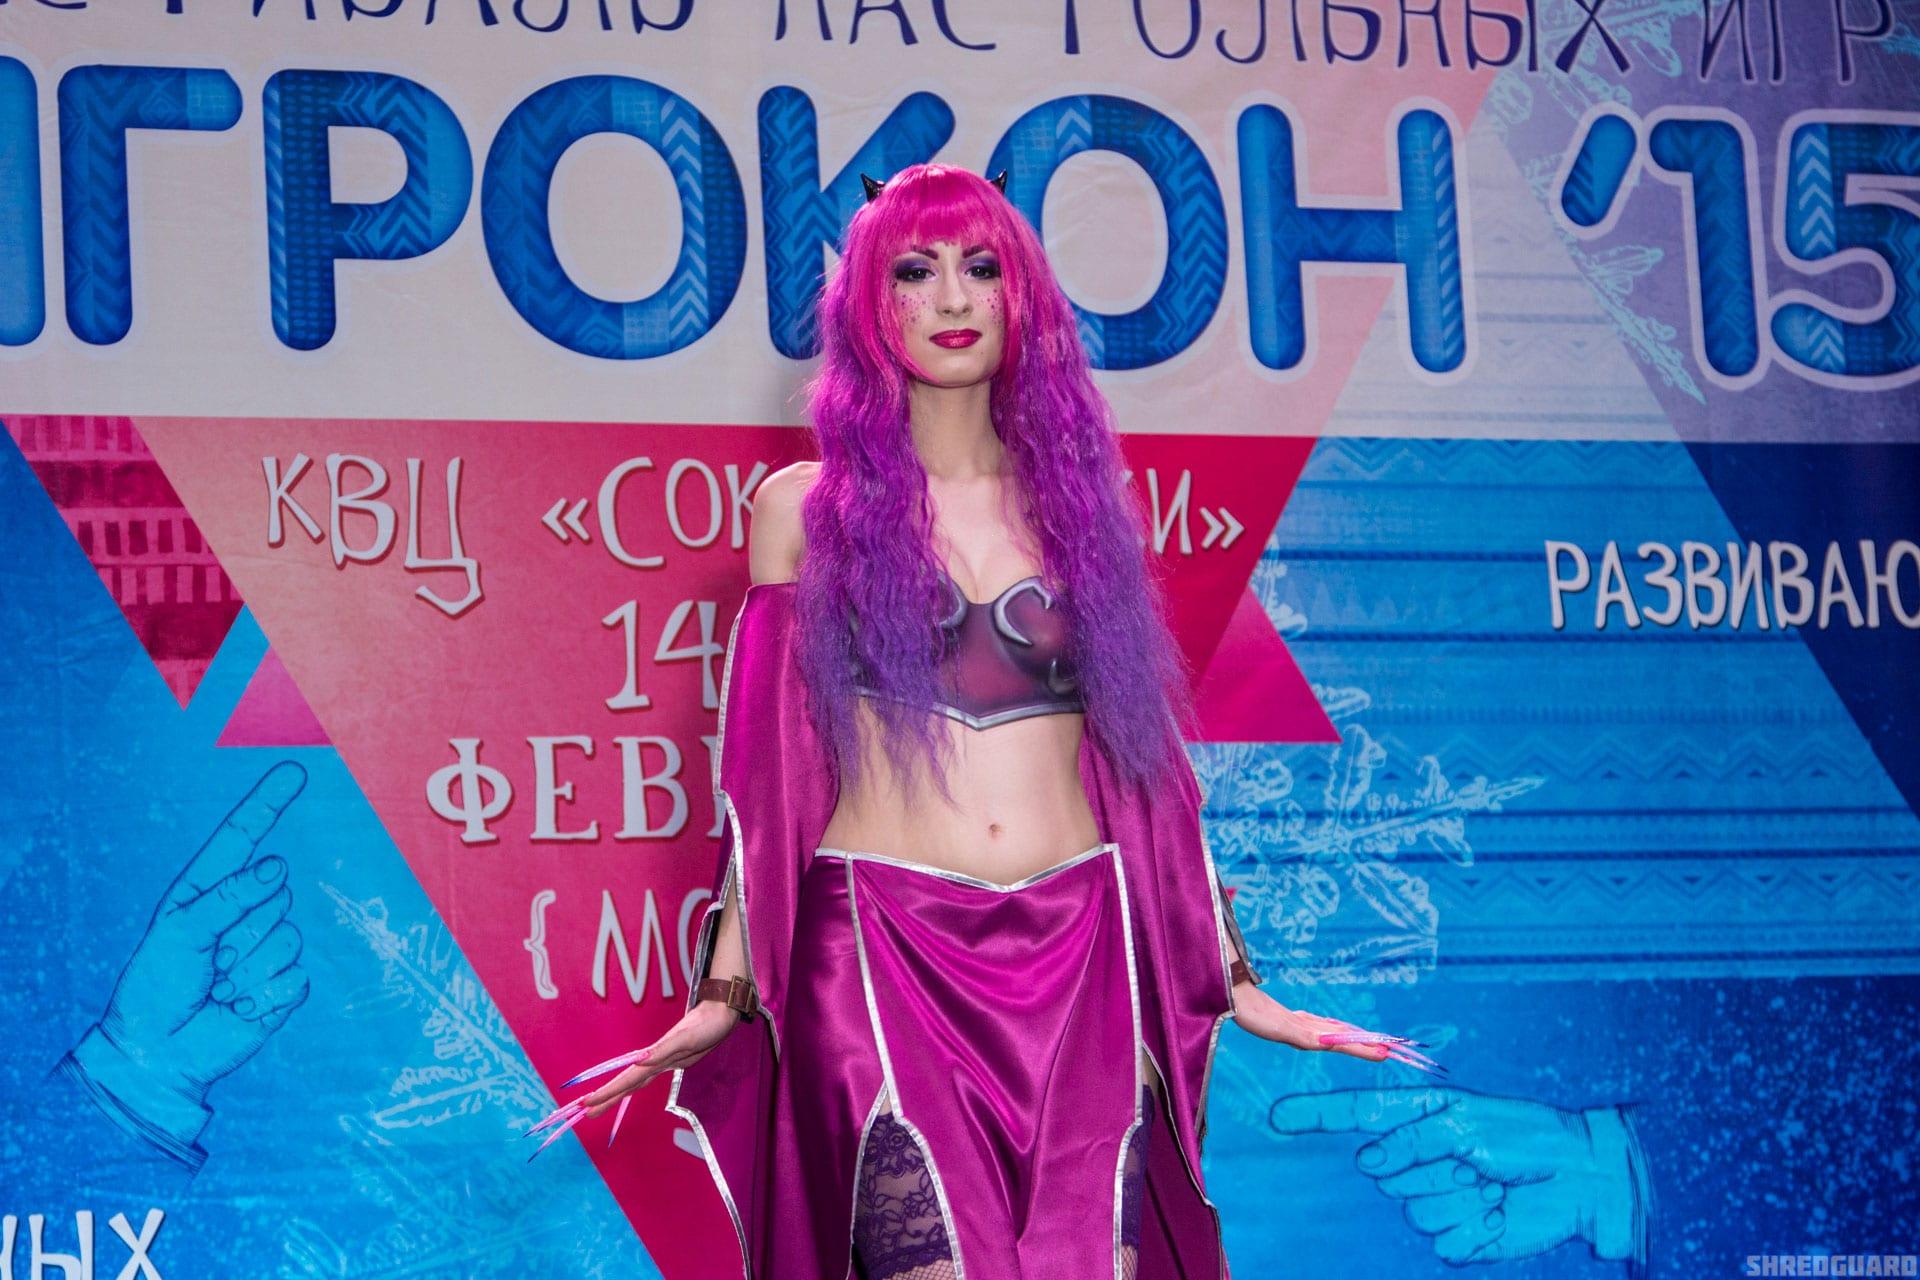 igrokon-2015-woman